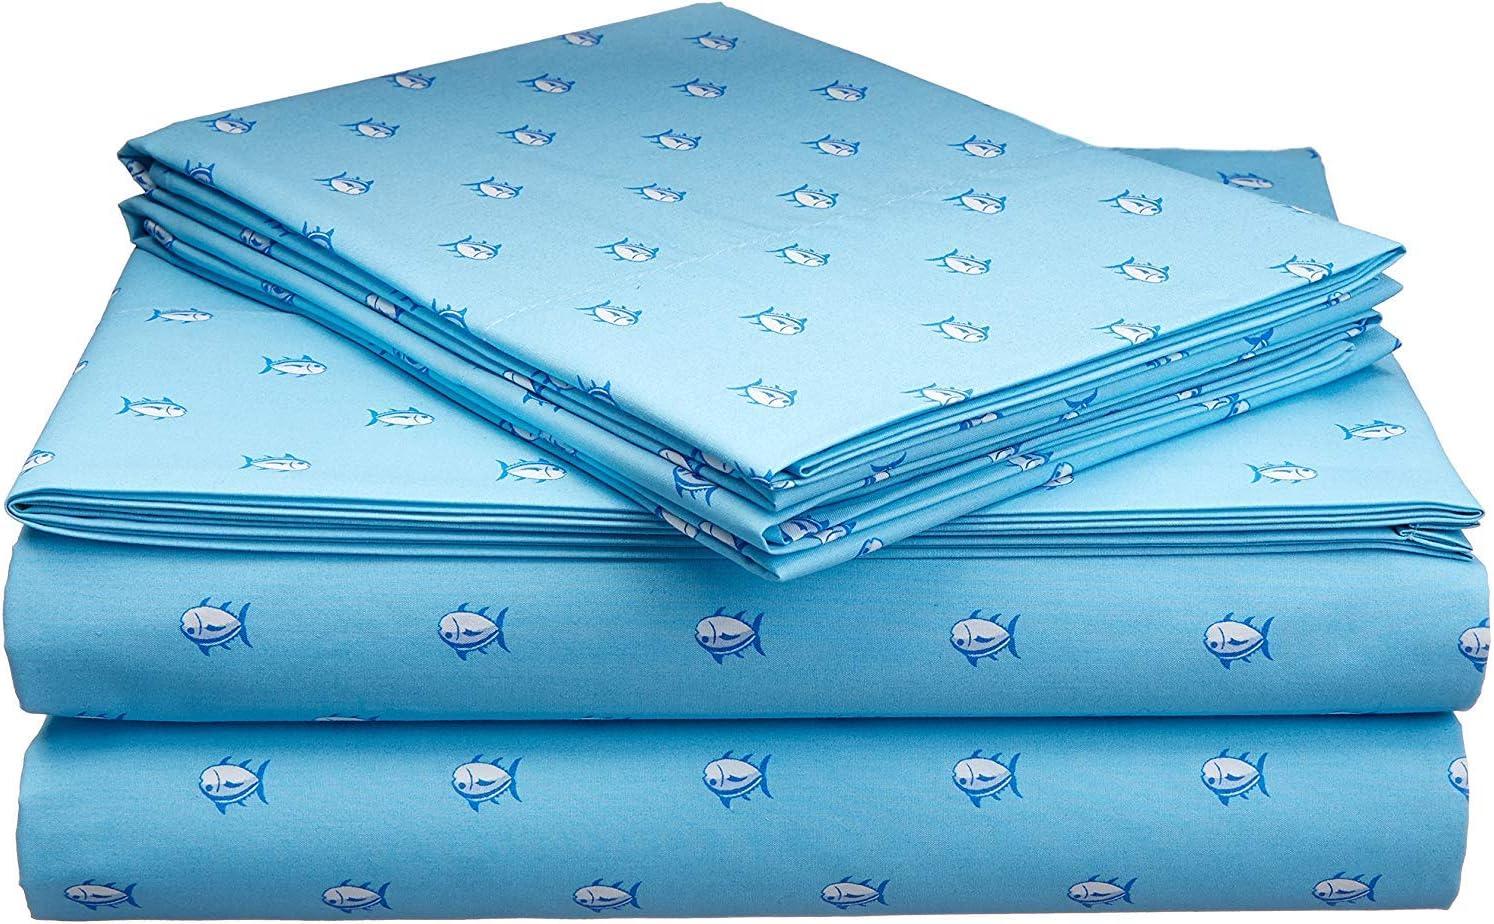 Southern Tide Printed Cotton Sheet Blue Topaz, King